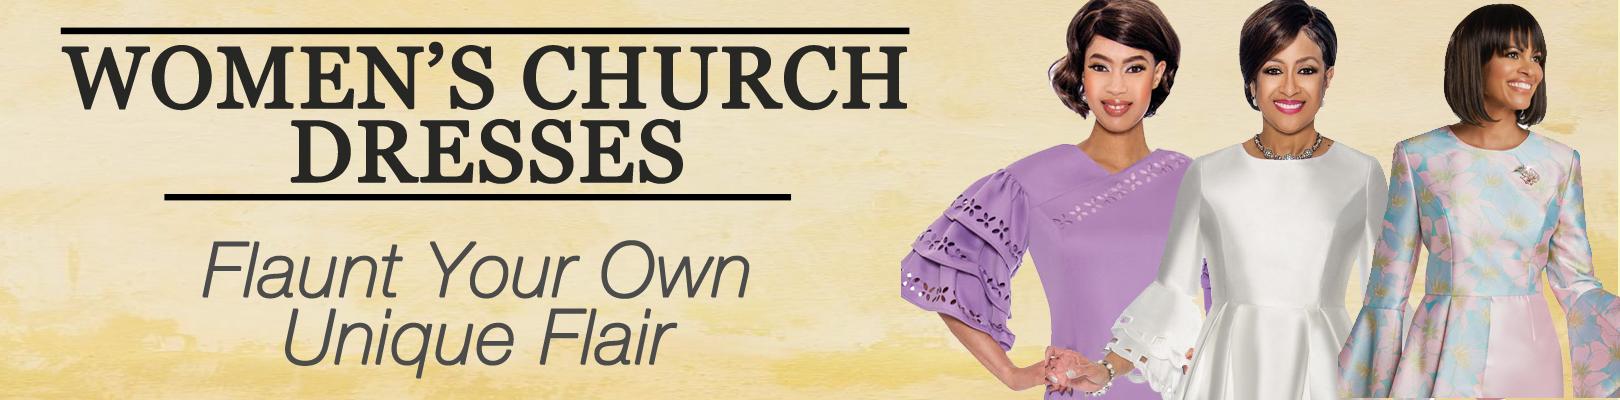 Church Dresses, Womens Church Dresses